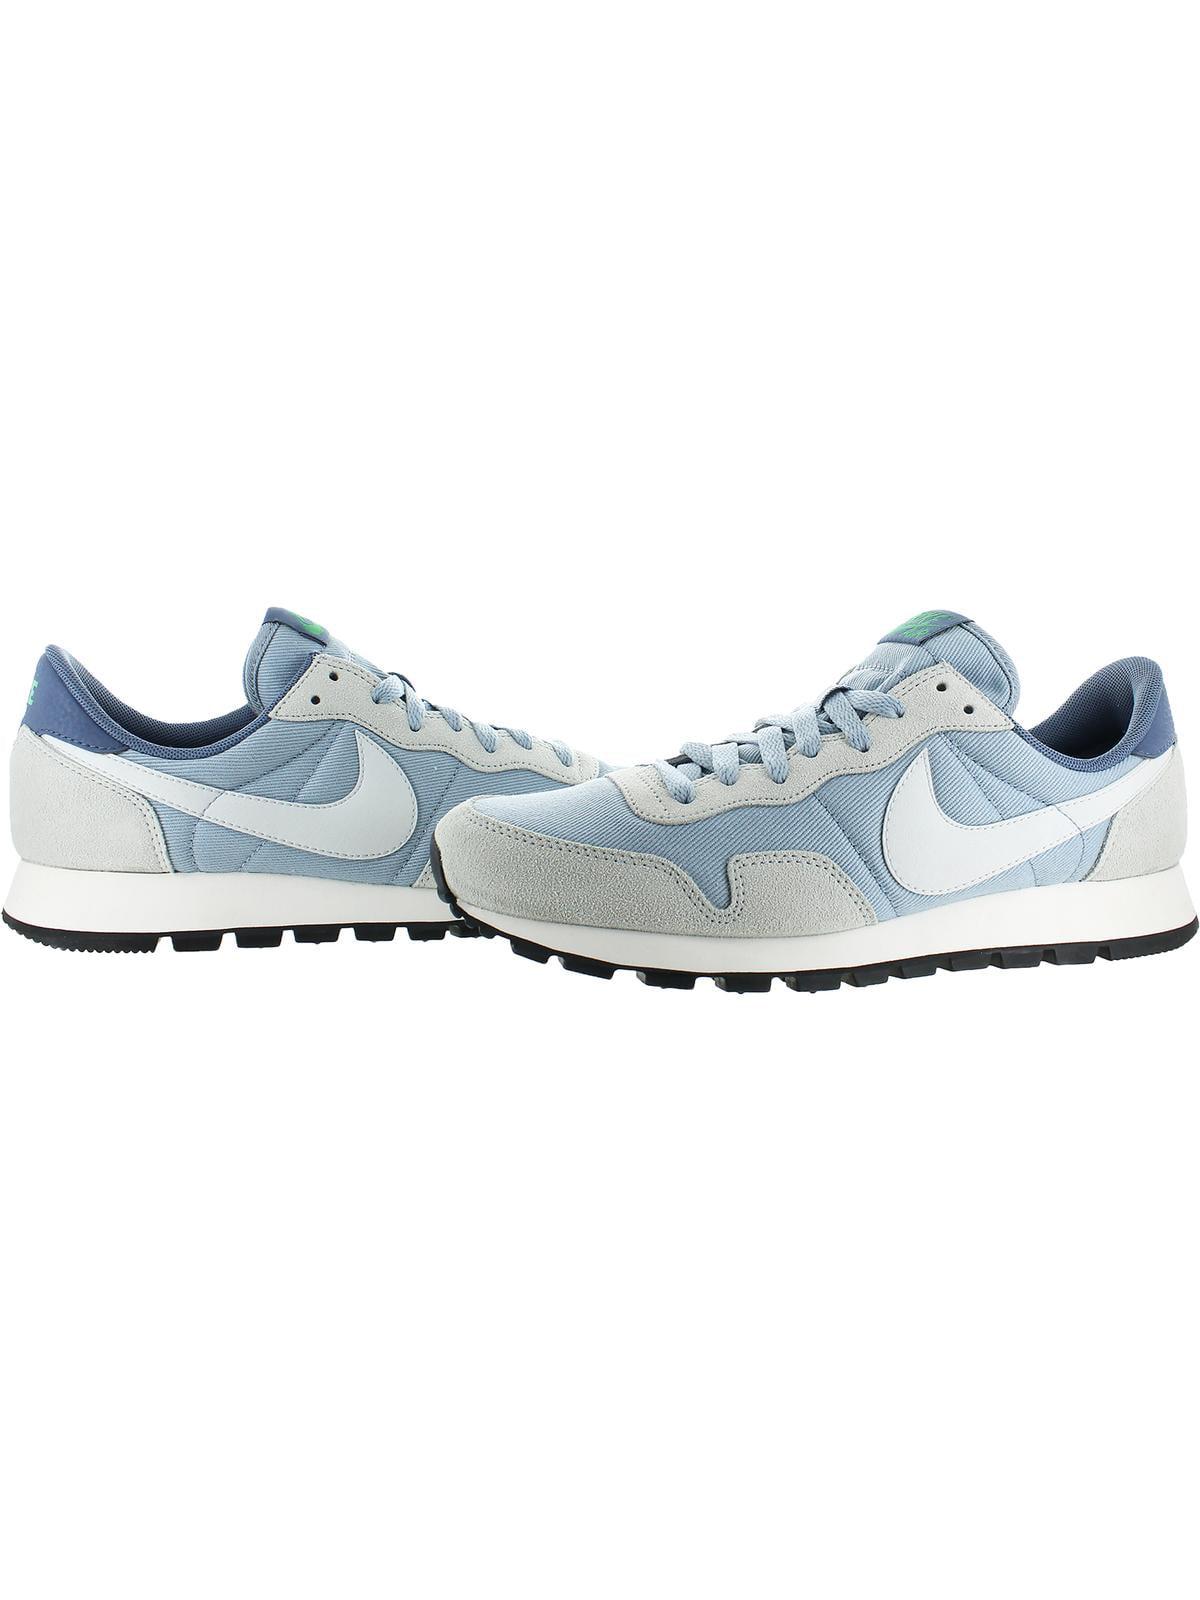 Nike Womens Air Pegasus '83 Suede Mesh Running Shoes Blue 11.5 Medium (B,M)